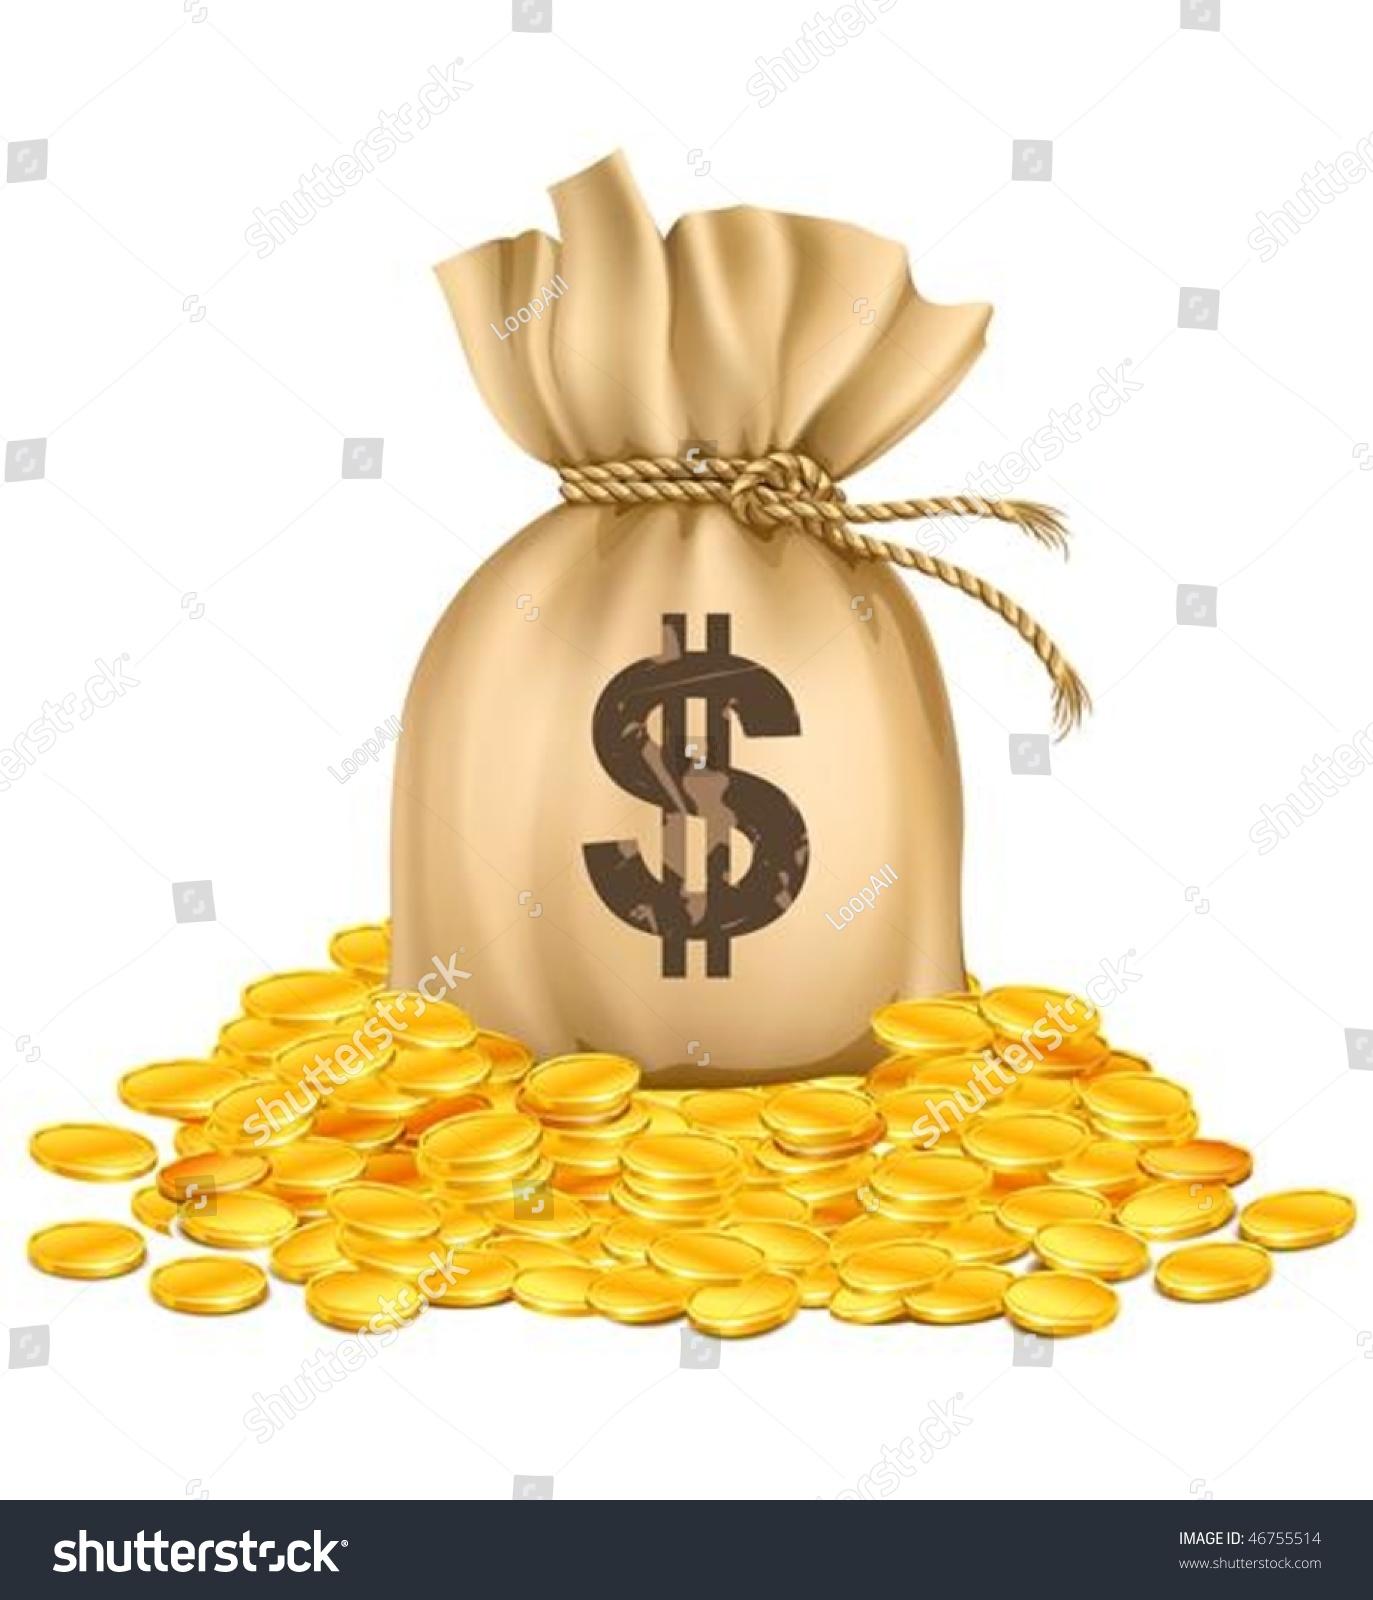 pile of money clipart - photo #50